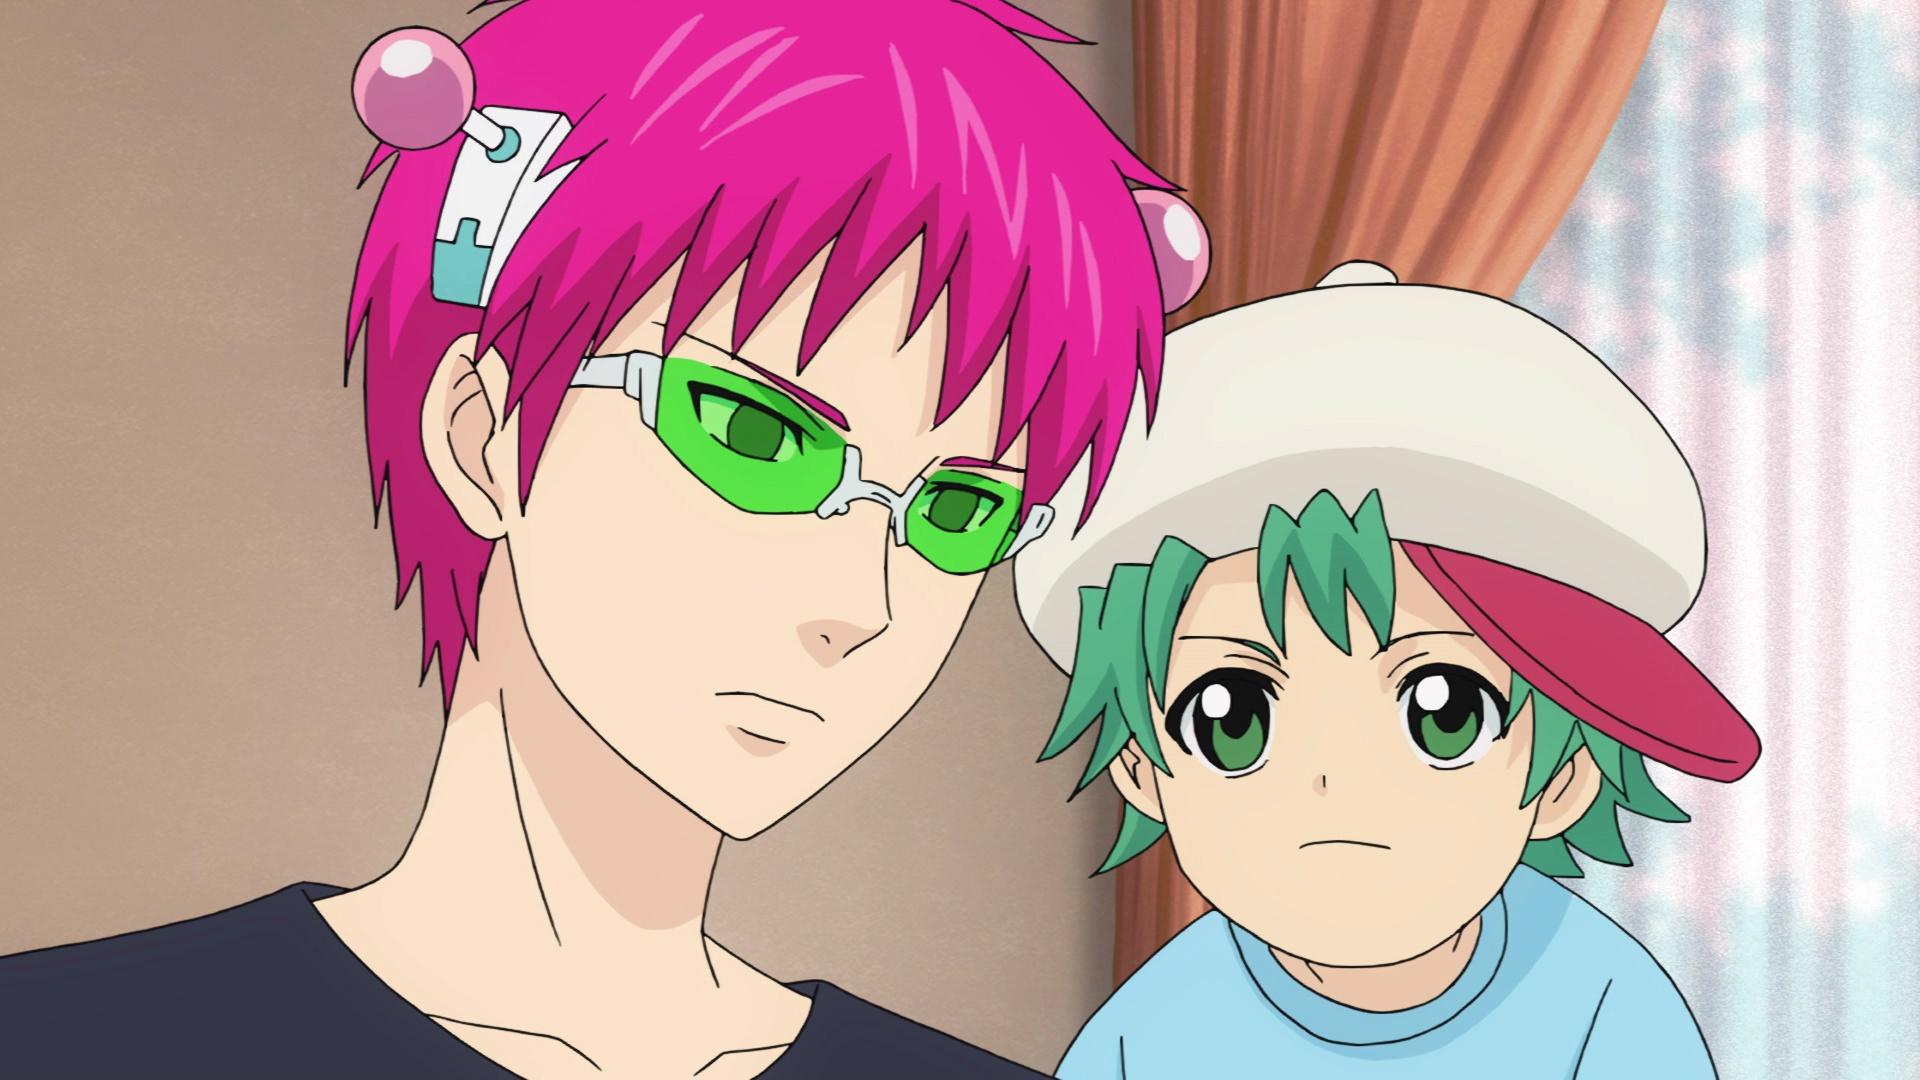 Watch the disastrous life of saiki k season 1 episode 11 anime on funimation - The disastrous life of saiki k season 2 episode 1 ...